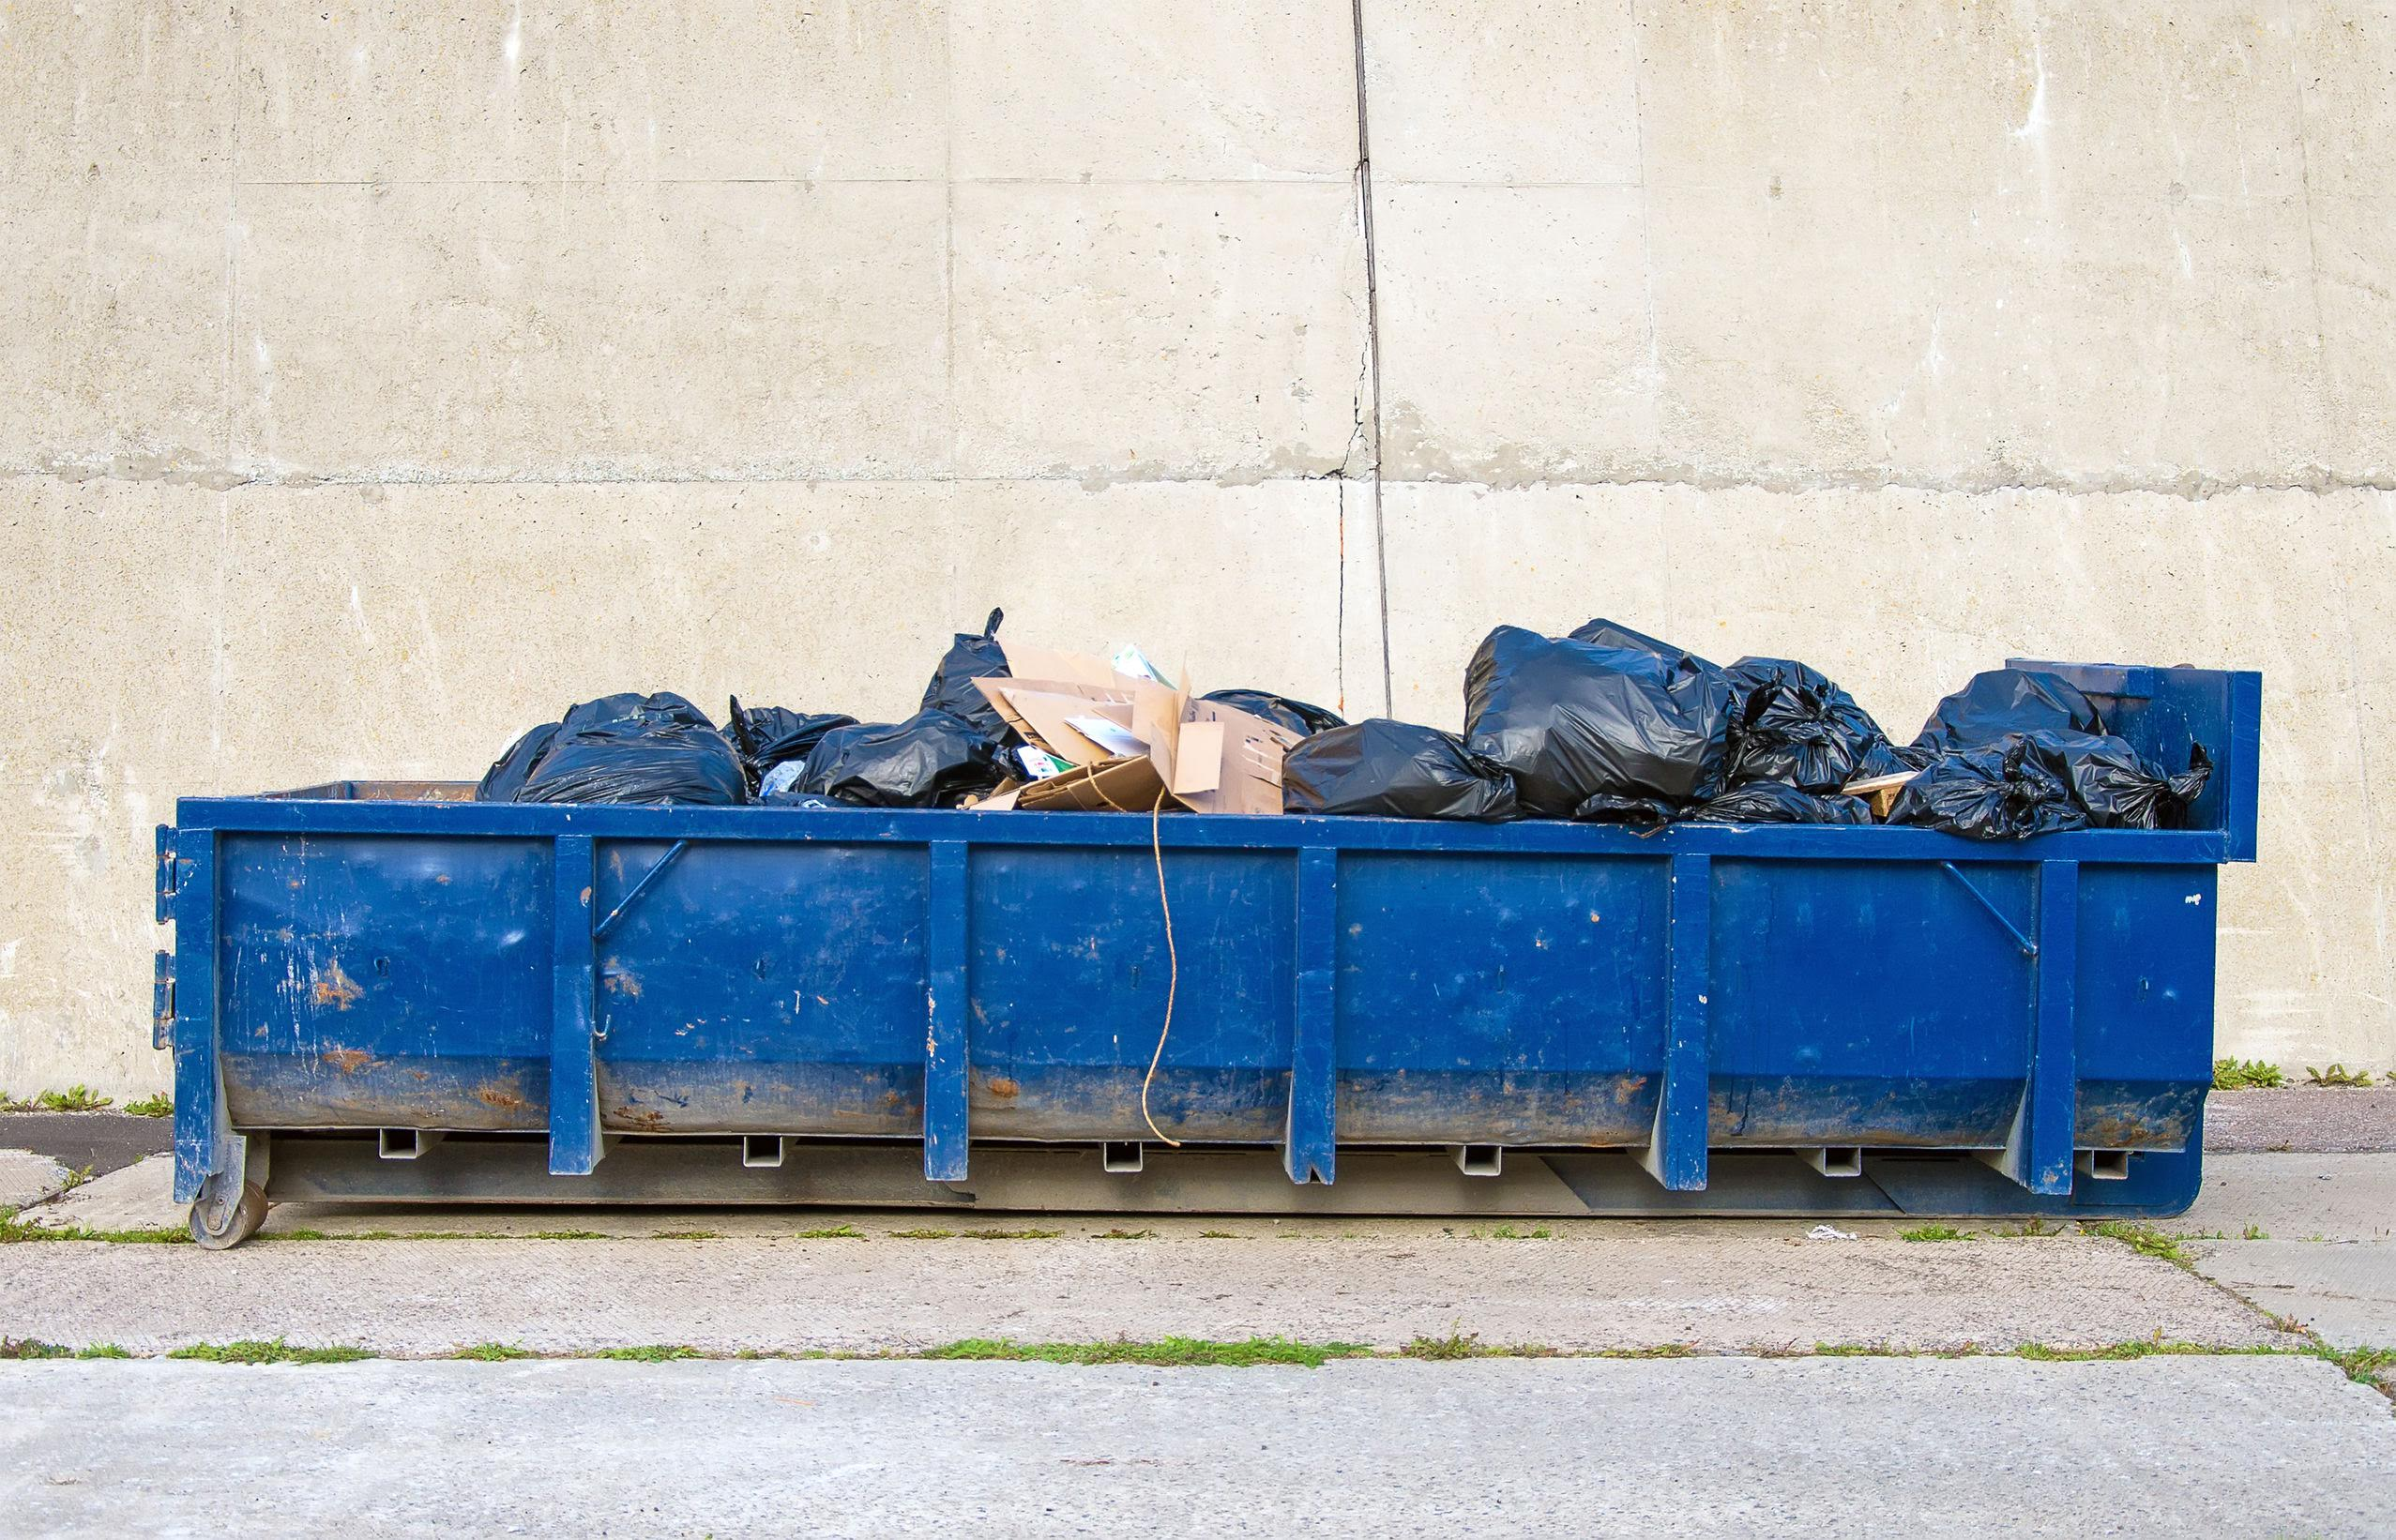 My Junk Company image 1